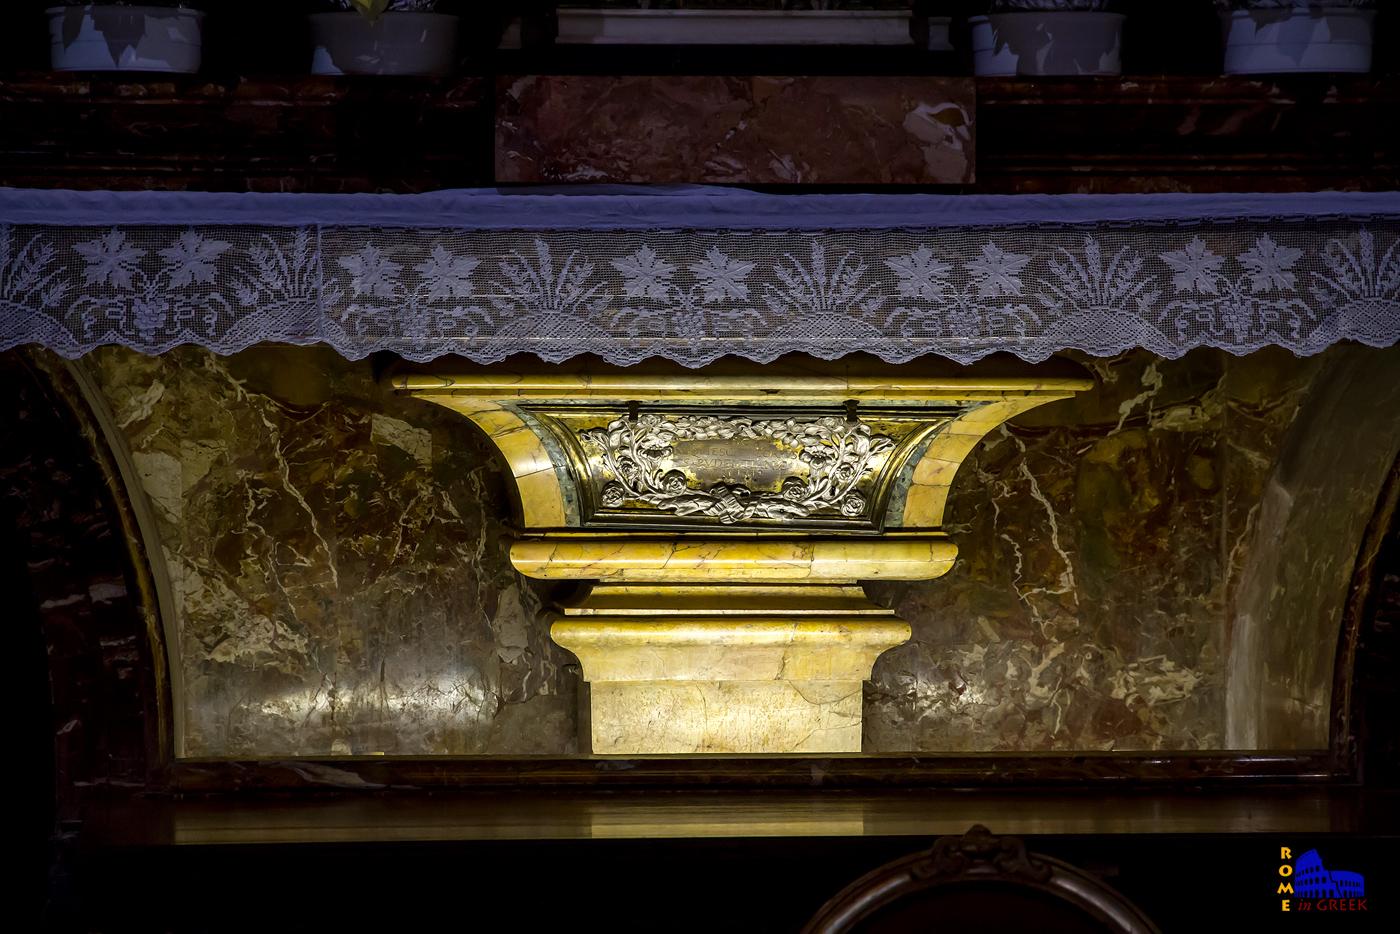 O τάφος της Αγ. Πουδεντιανής κάτω από την Αγία Τράπεζα. Αλλά εφόσον στην πραγματικότητα δεν υπήρξε ποτέ τέτοια αγία, ποιος βρίσκεται εκεί θαμμένος;